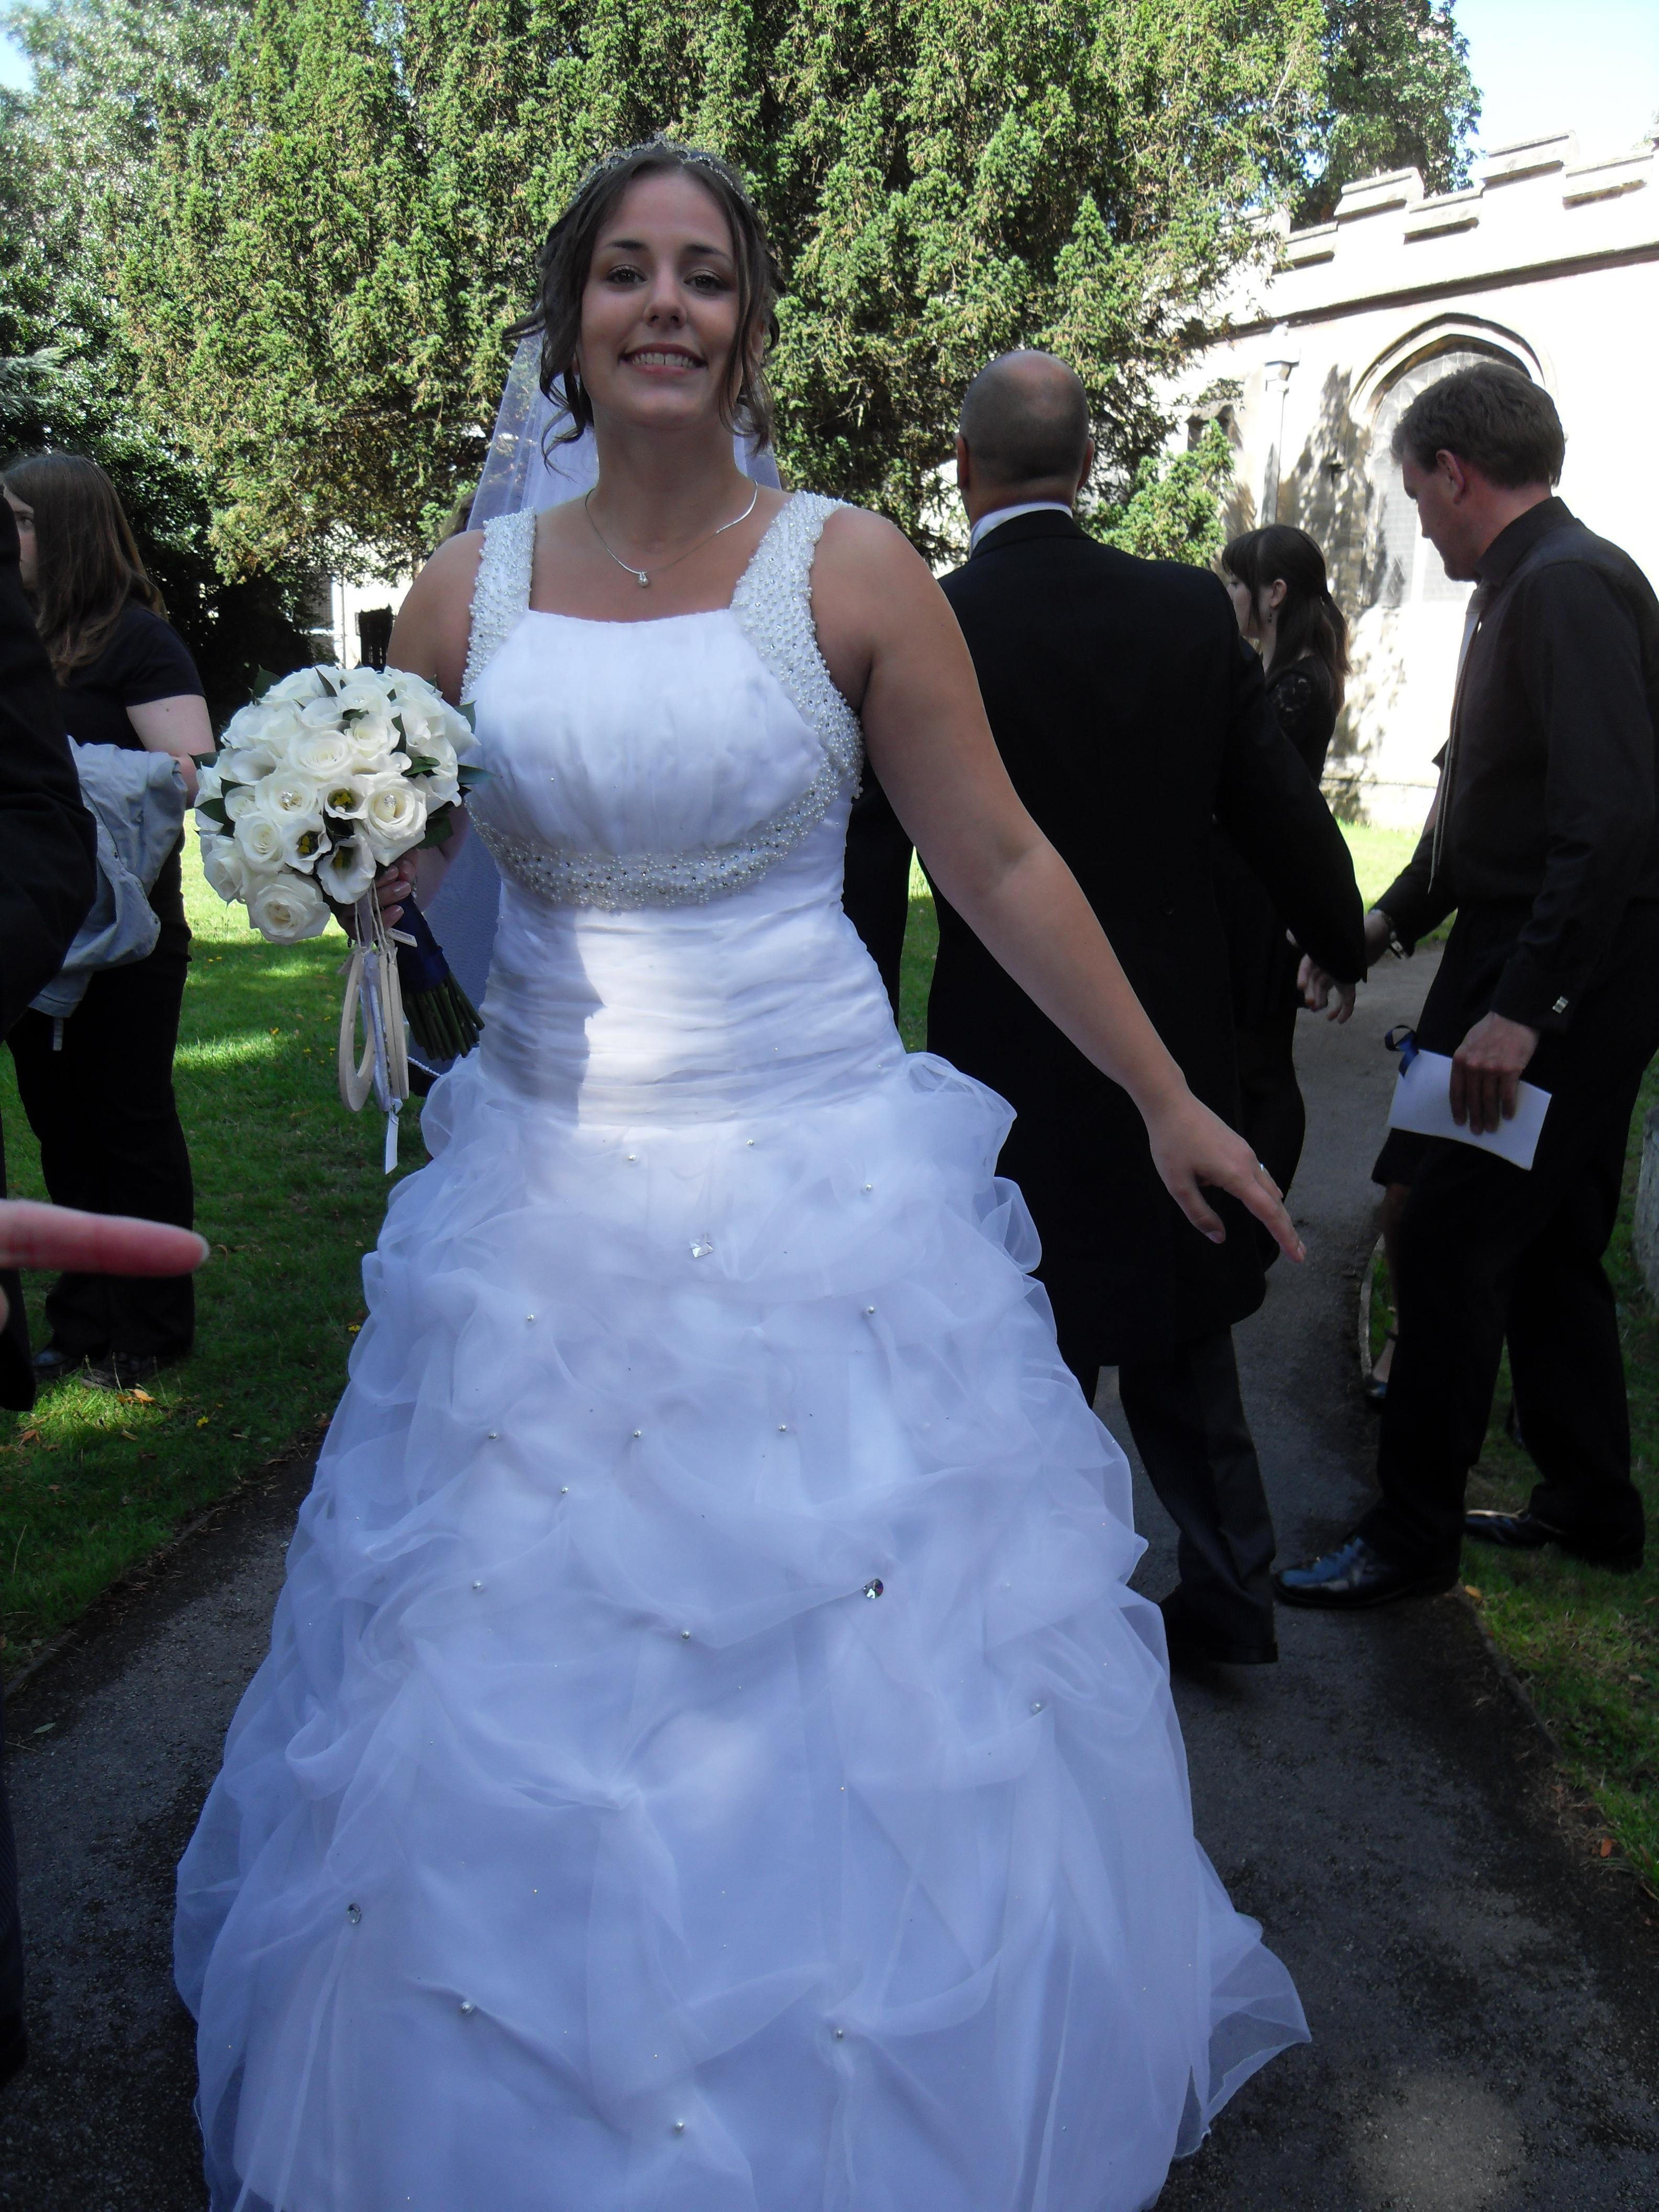 Bespoke wedding gown